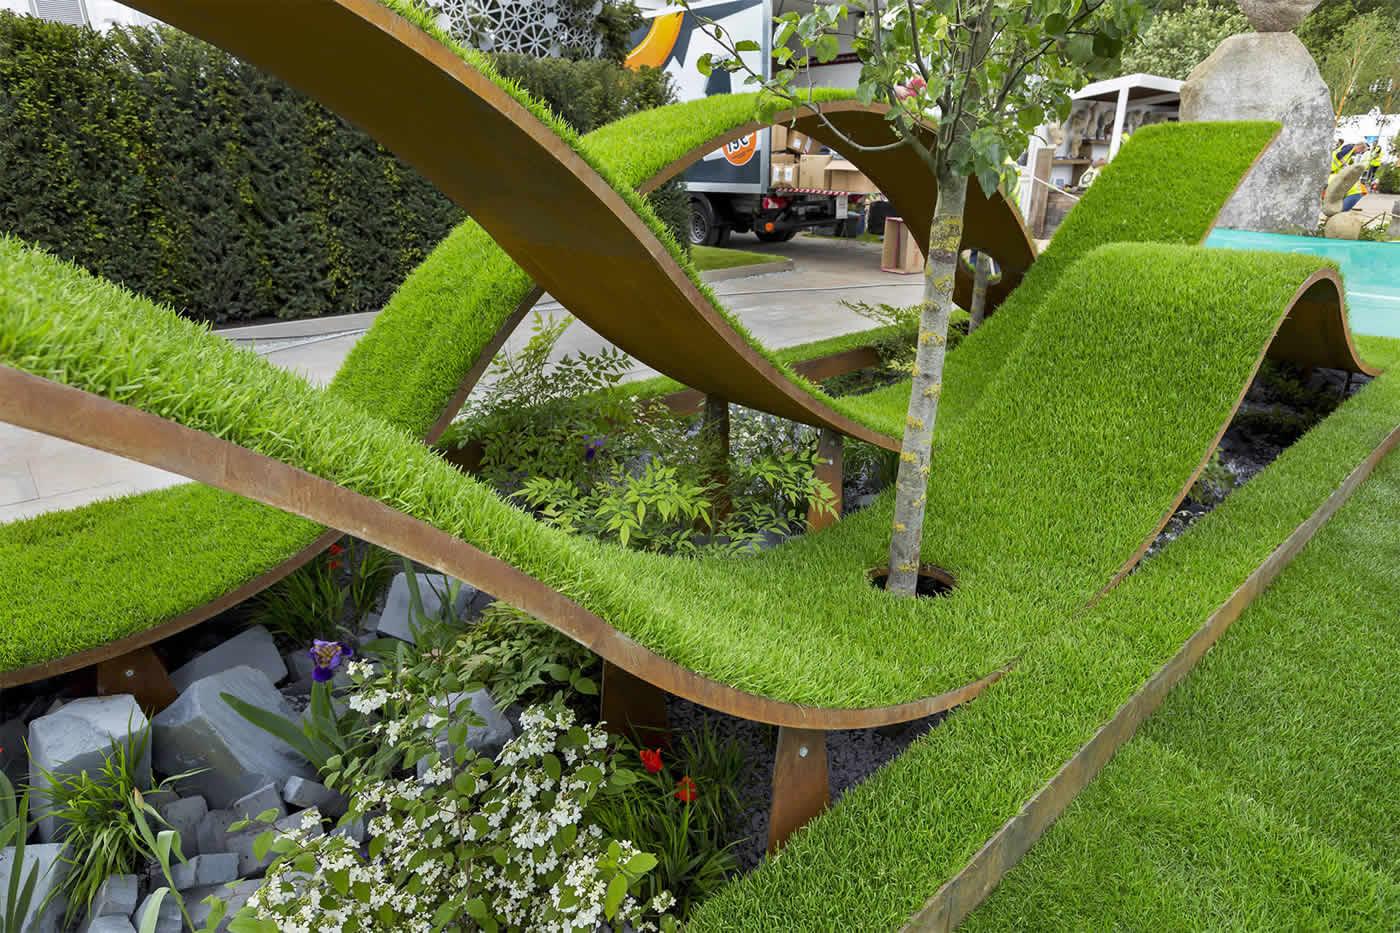 award winning garden rhs chelsea flower show 16 by the garden builders